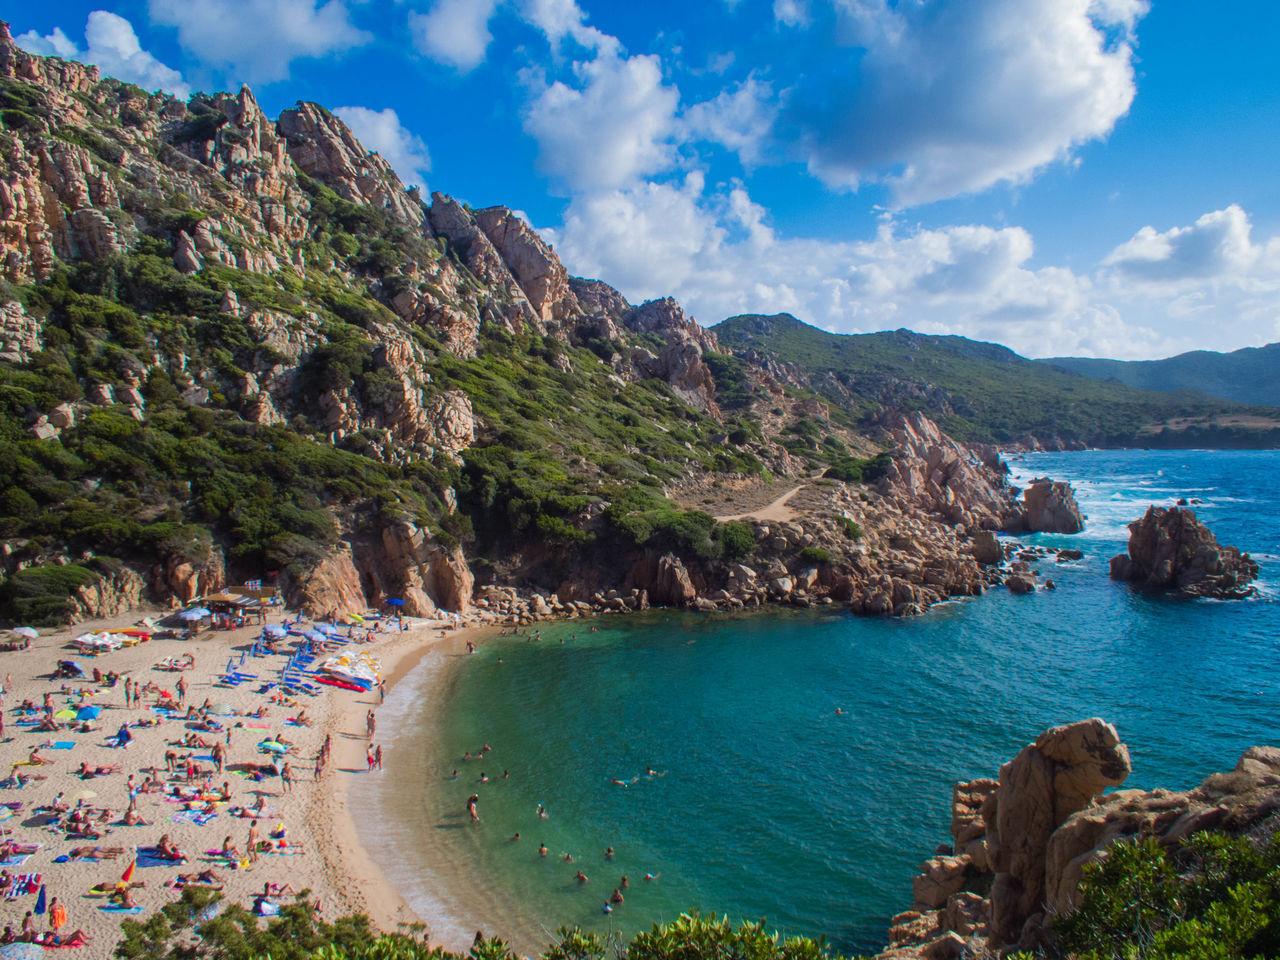 Li Cossi Maresardo Sardegna Sardegnamare Sardinia Sardinia Sardegna Italy  Sea Spiaggia